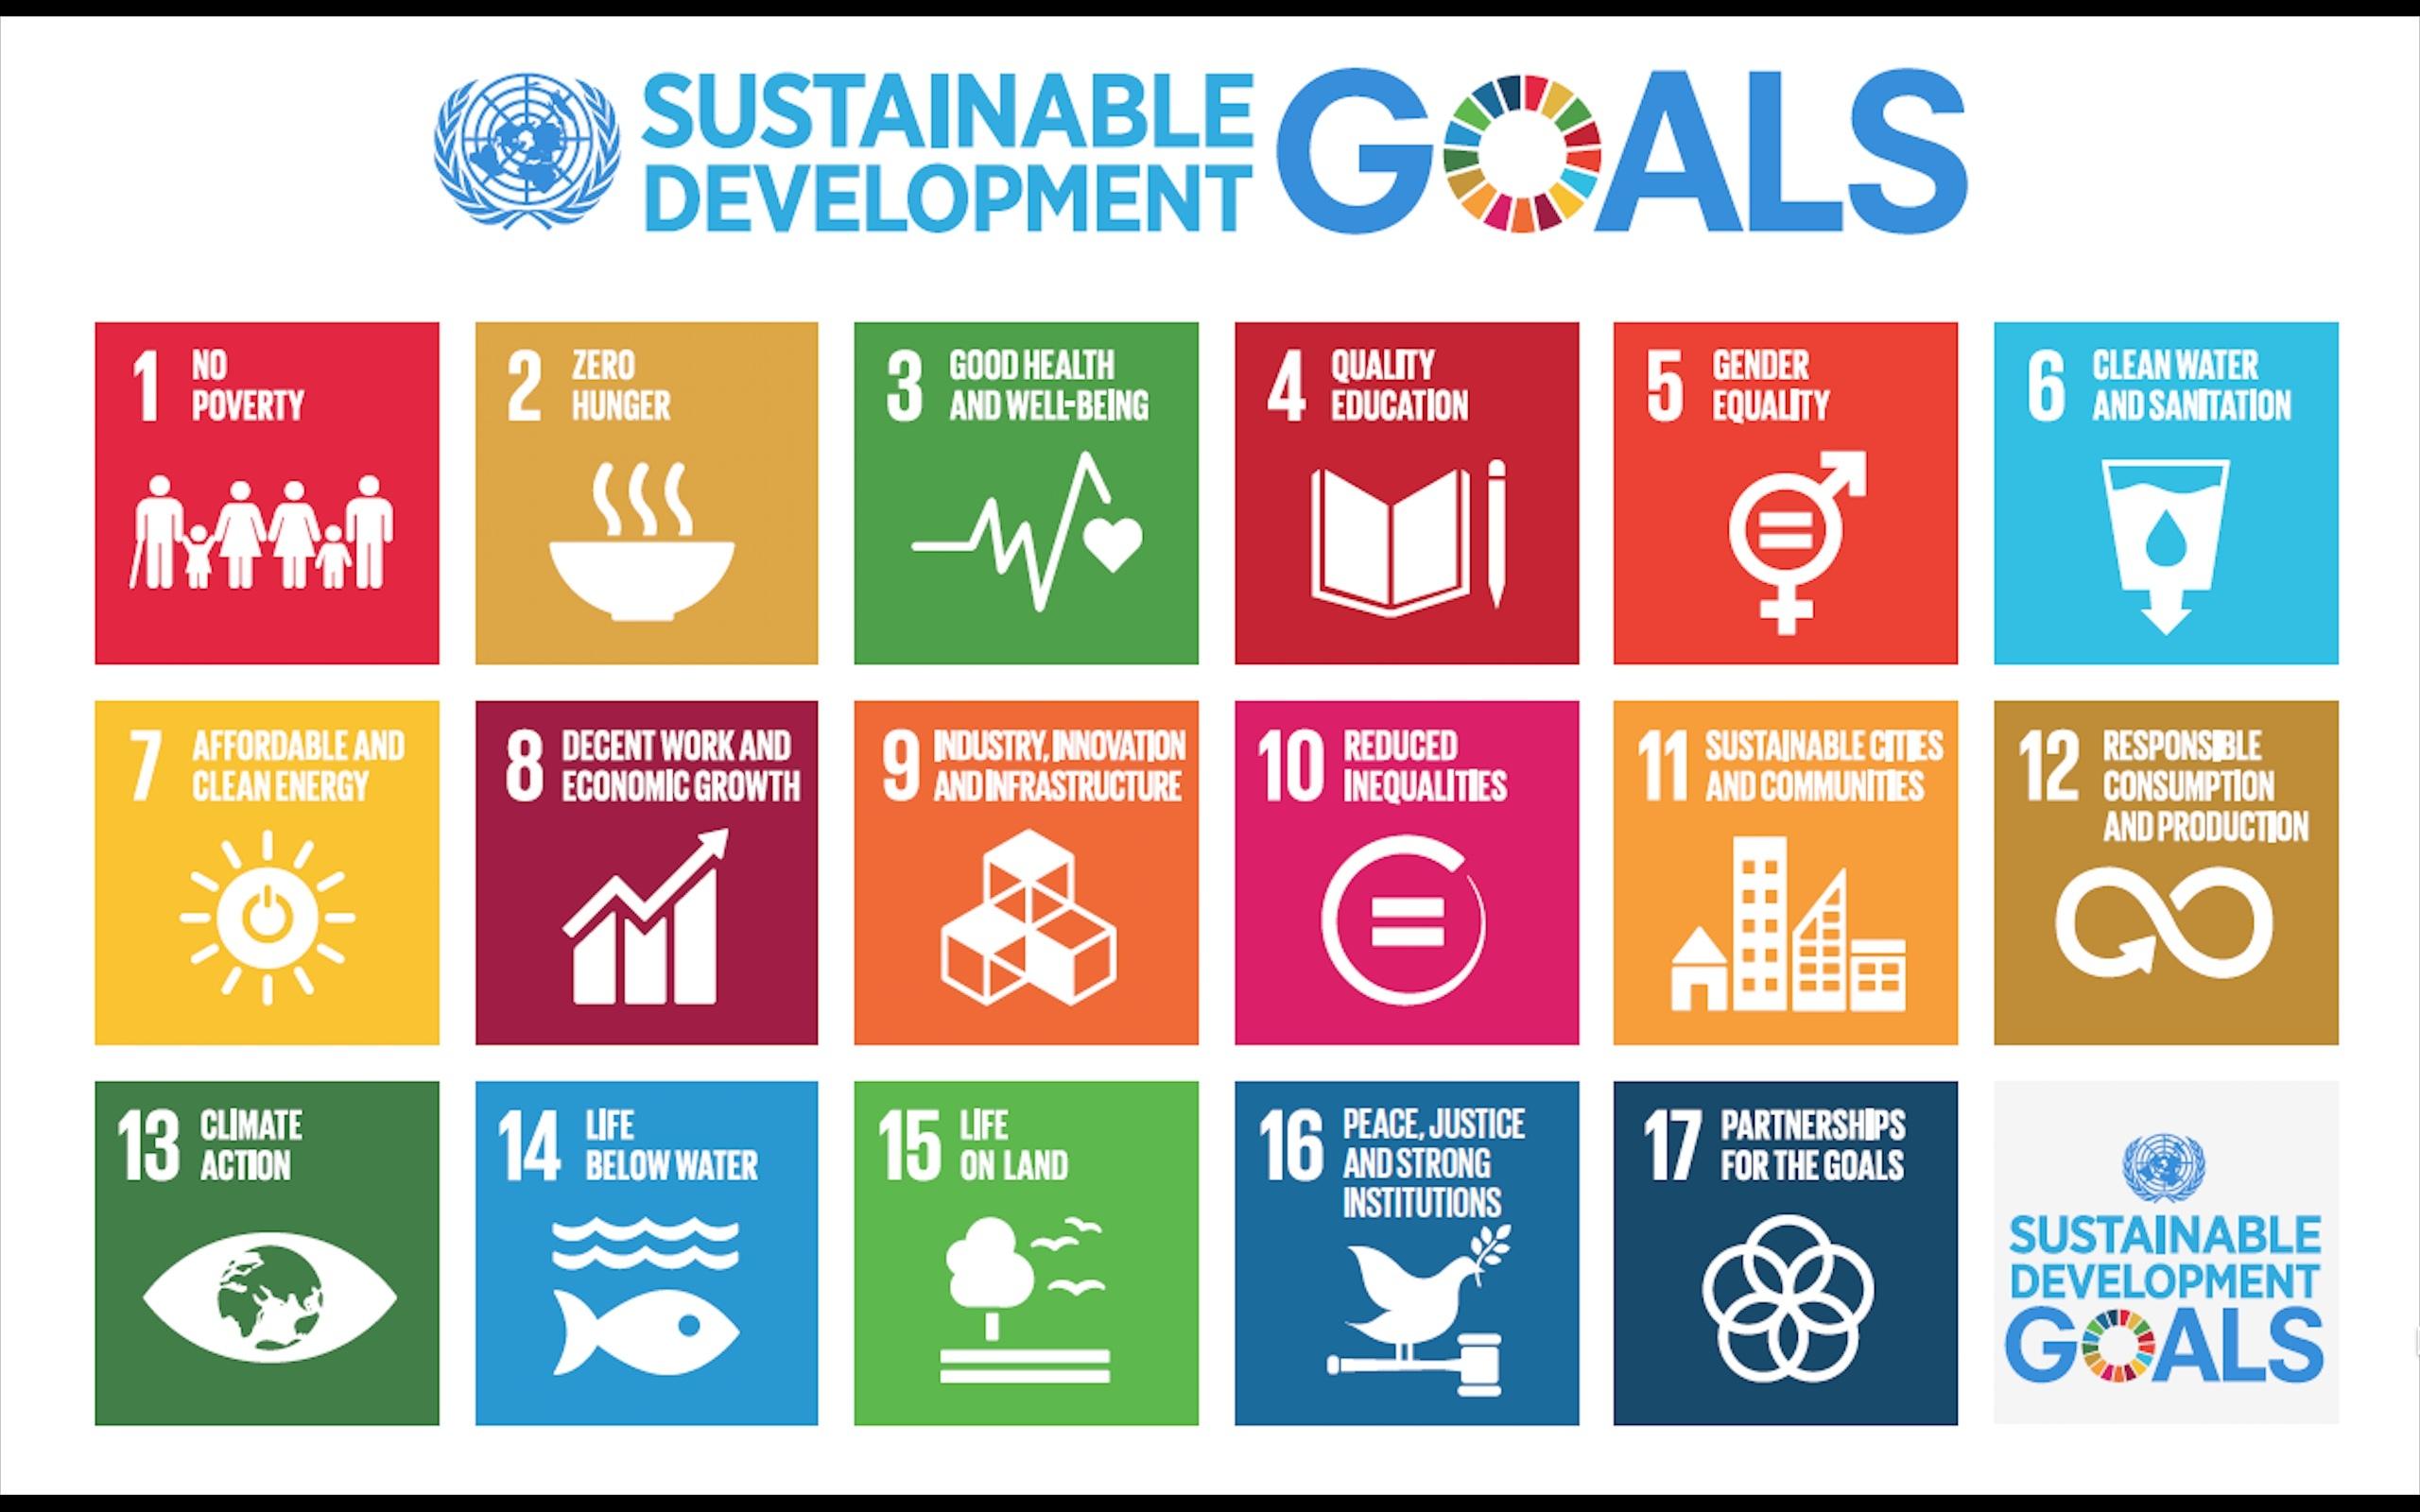 Sustainable Development Goals (SDGs) depicting 17 steps.